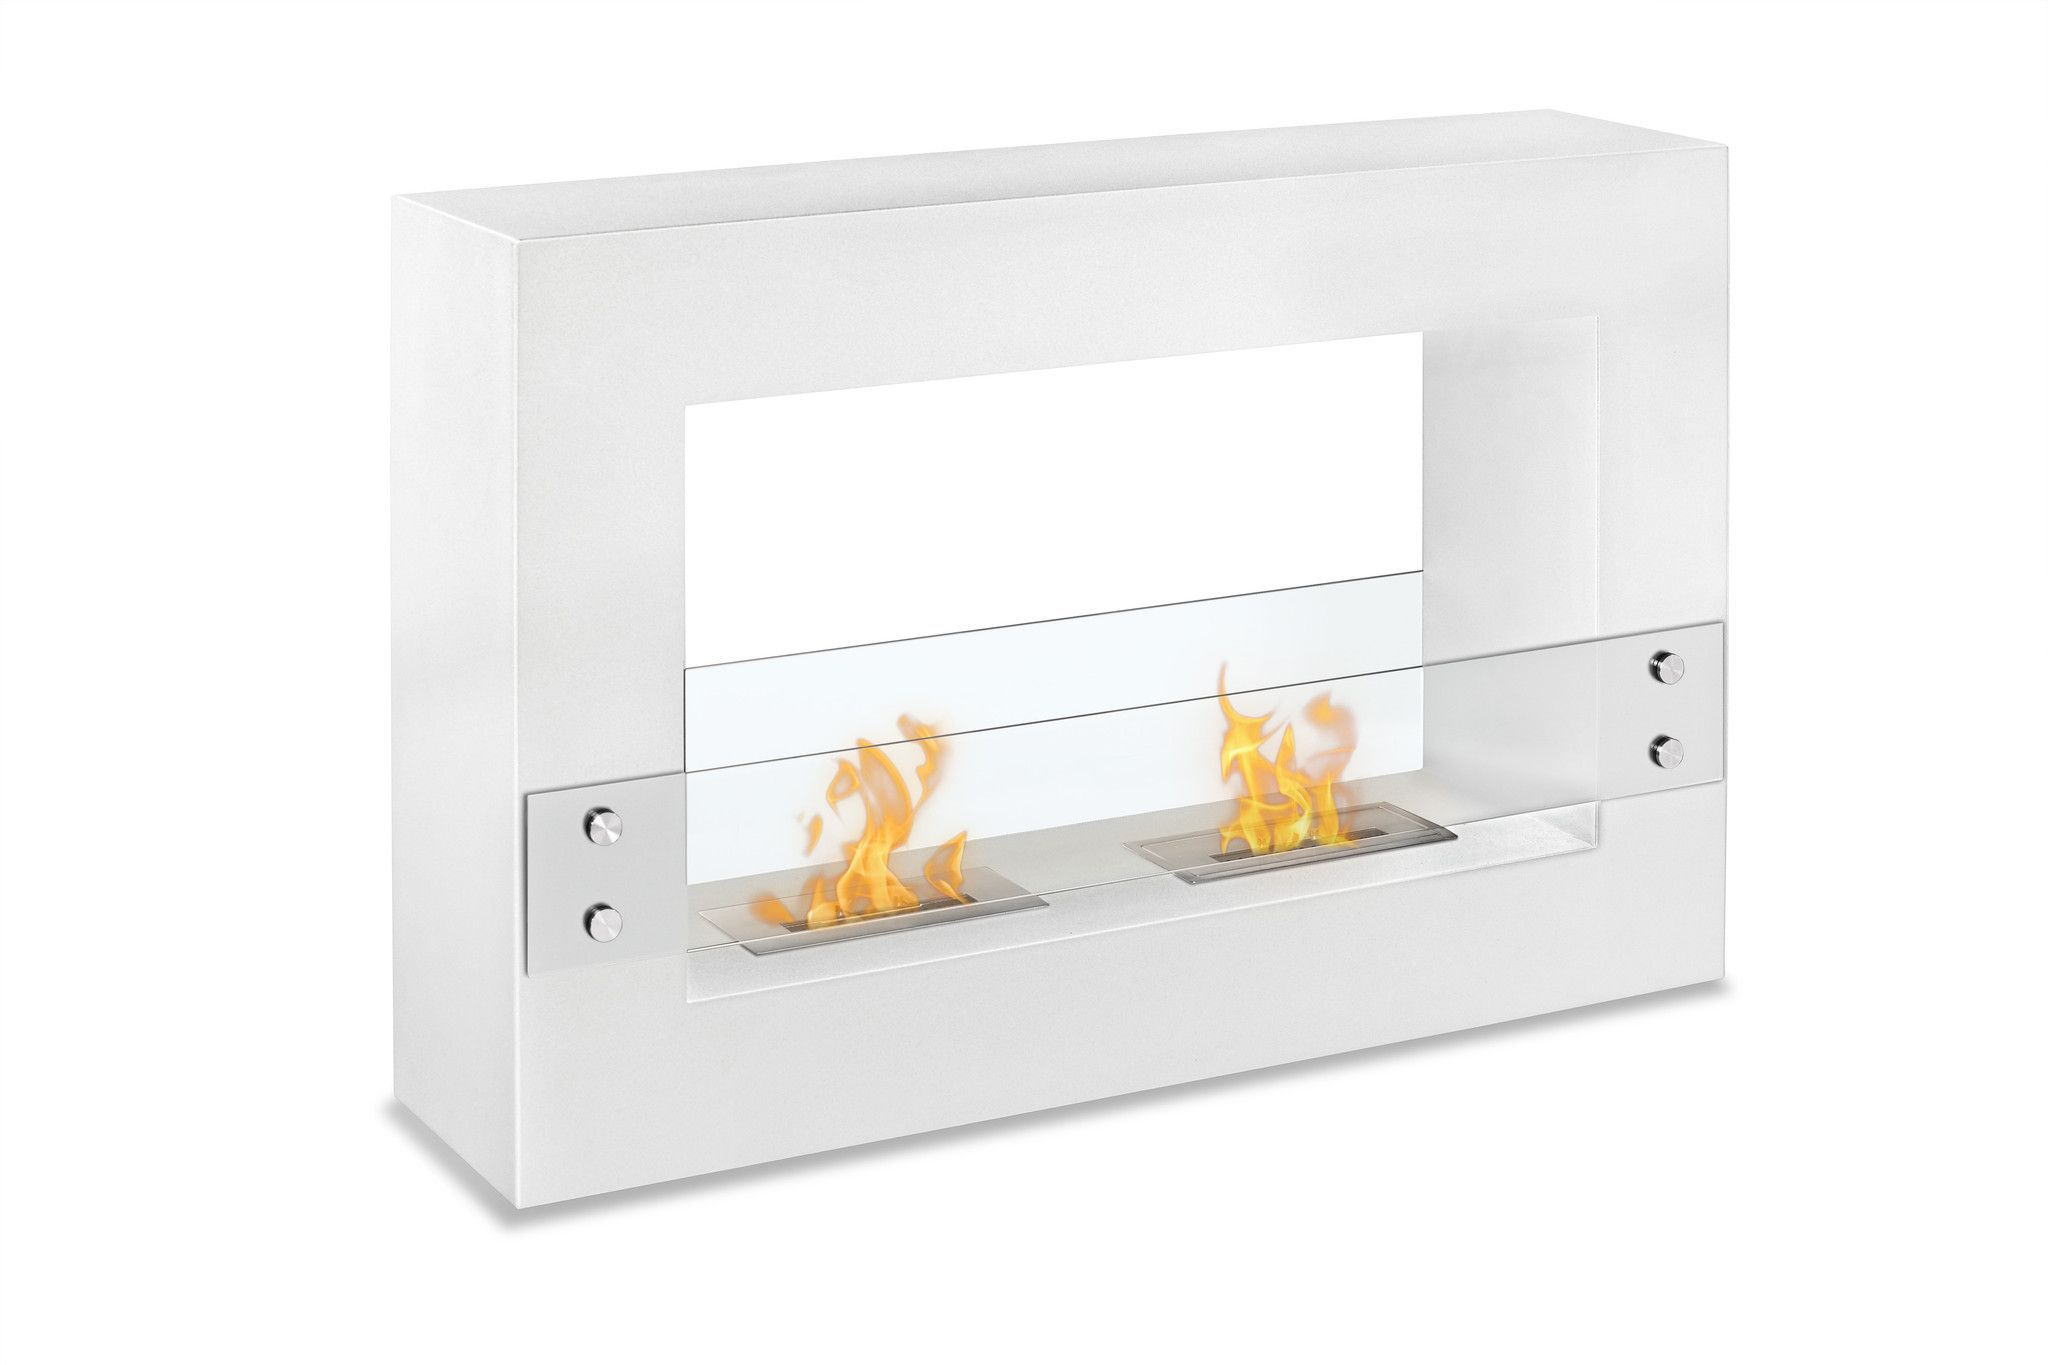 "Ignis Tectum White 47"" Free Standing Ethanol Fireplace"